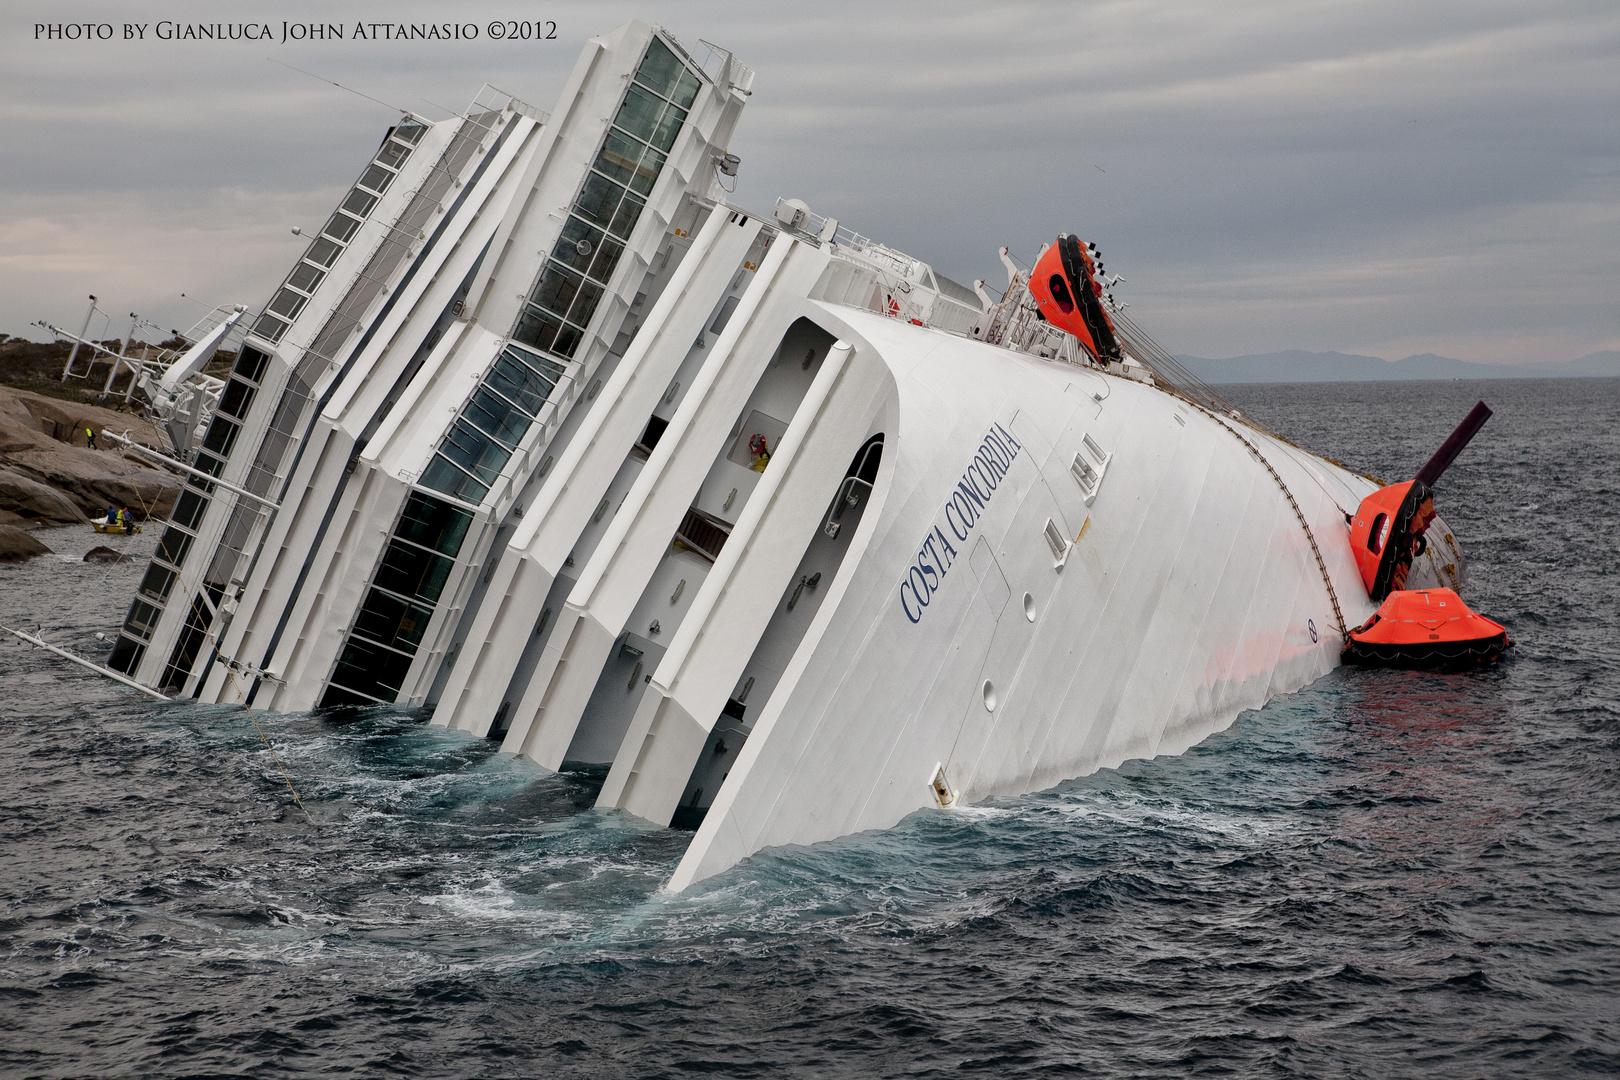 Costa Concordia disaster